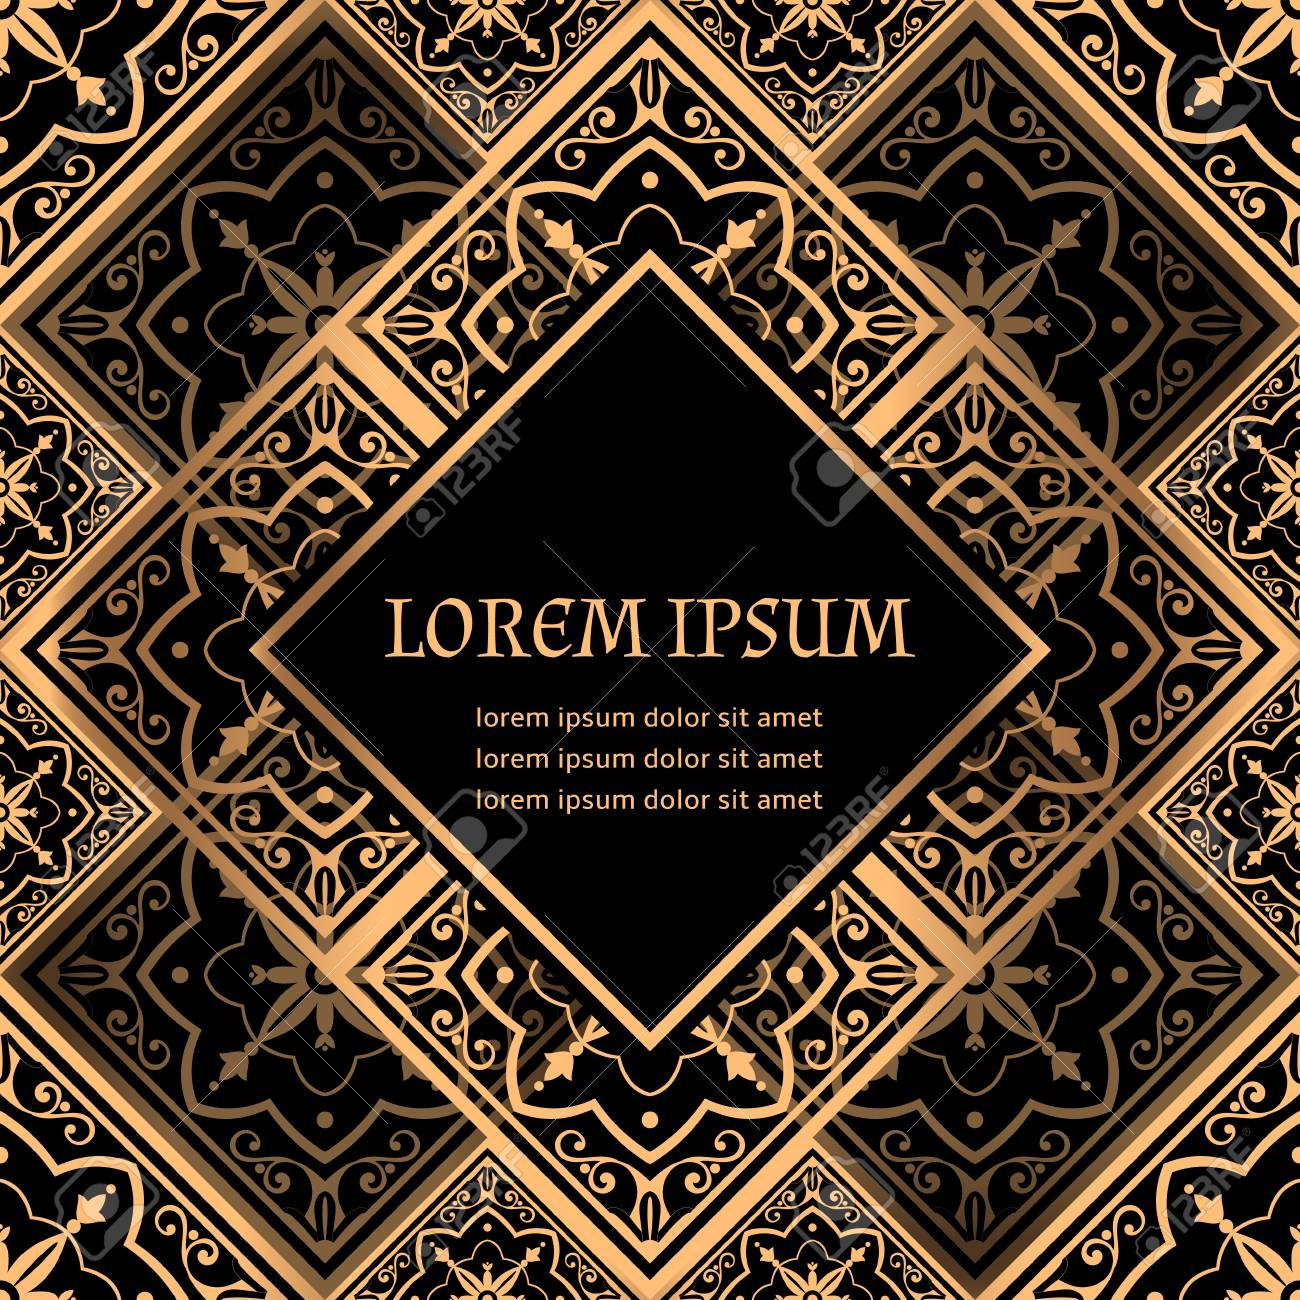 Luxury Background Vector Golden Royal Pattern Victorian Frame